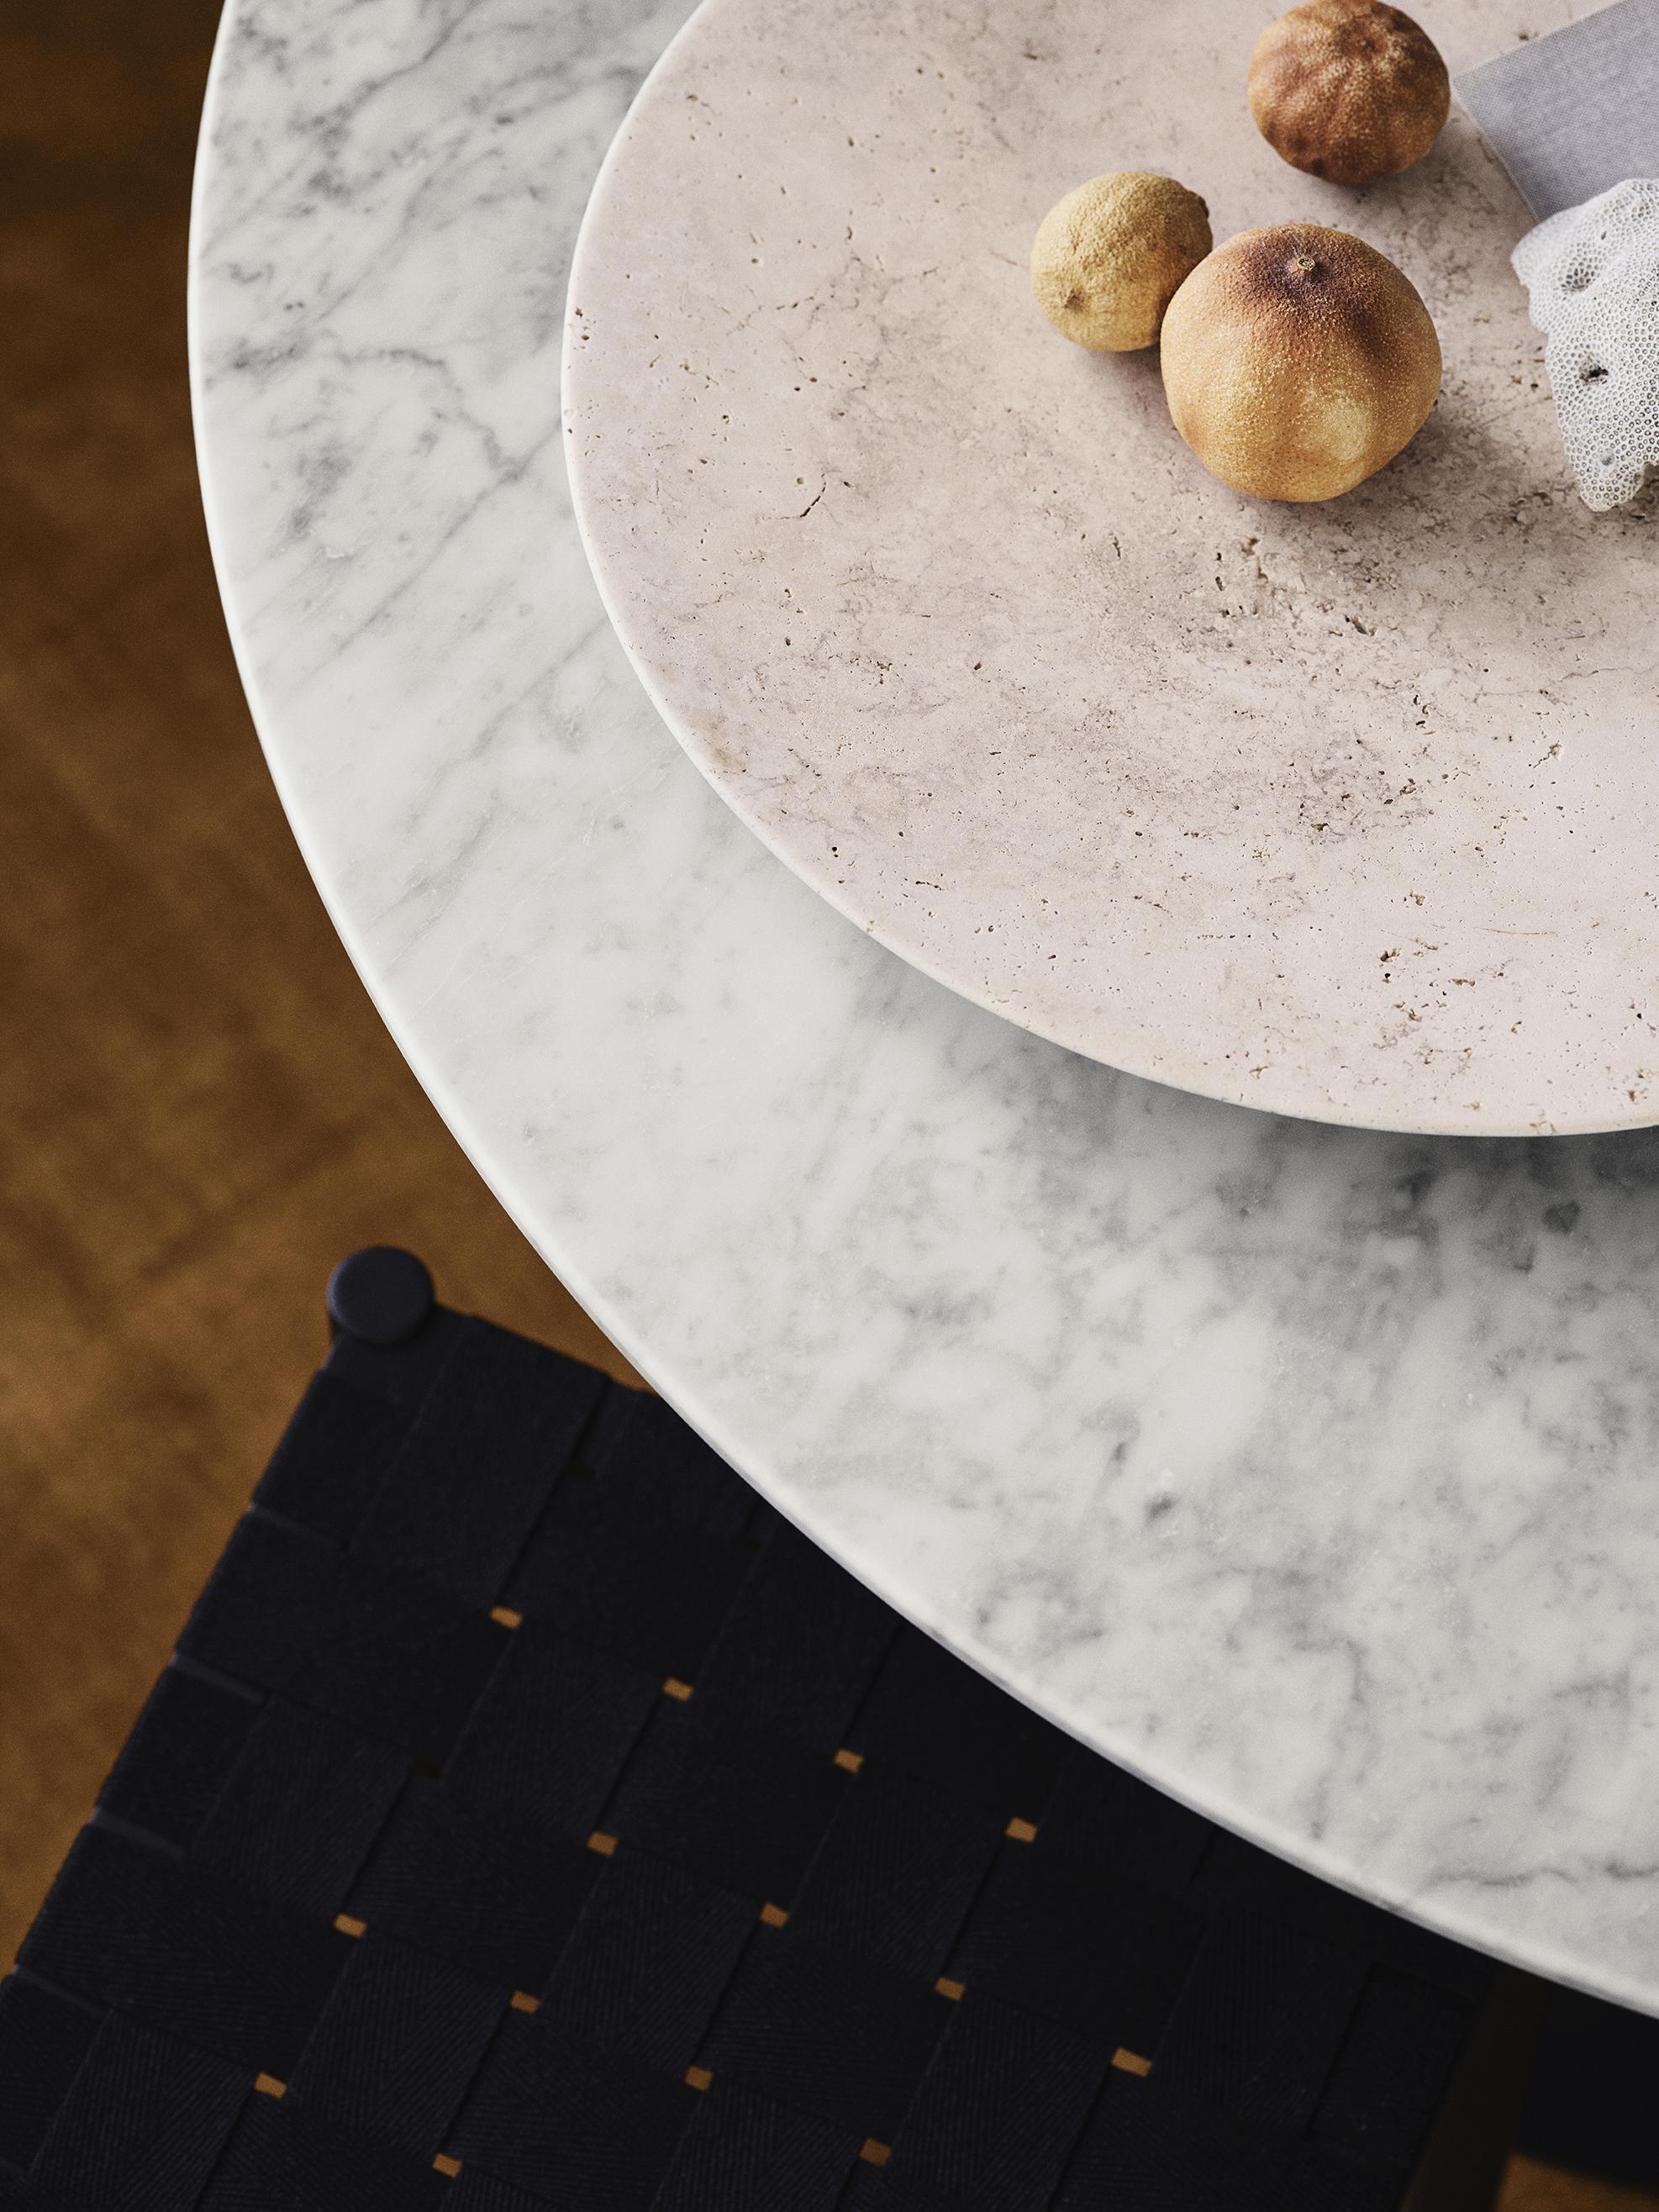 &Tradition In Between SK18 Table Top Bianco Carrara